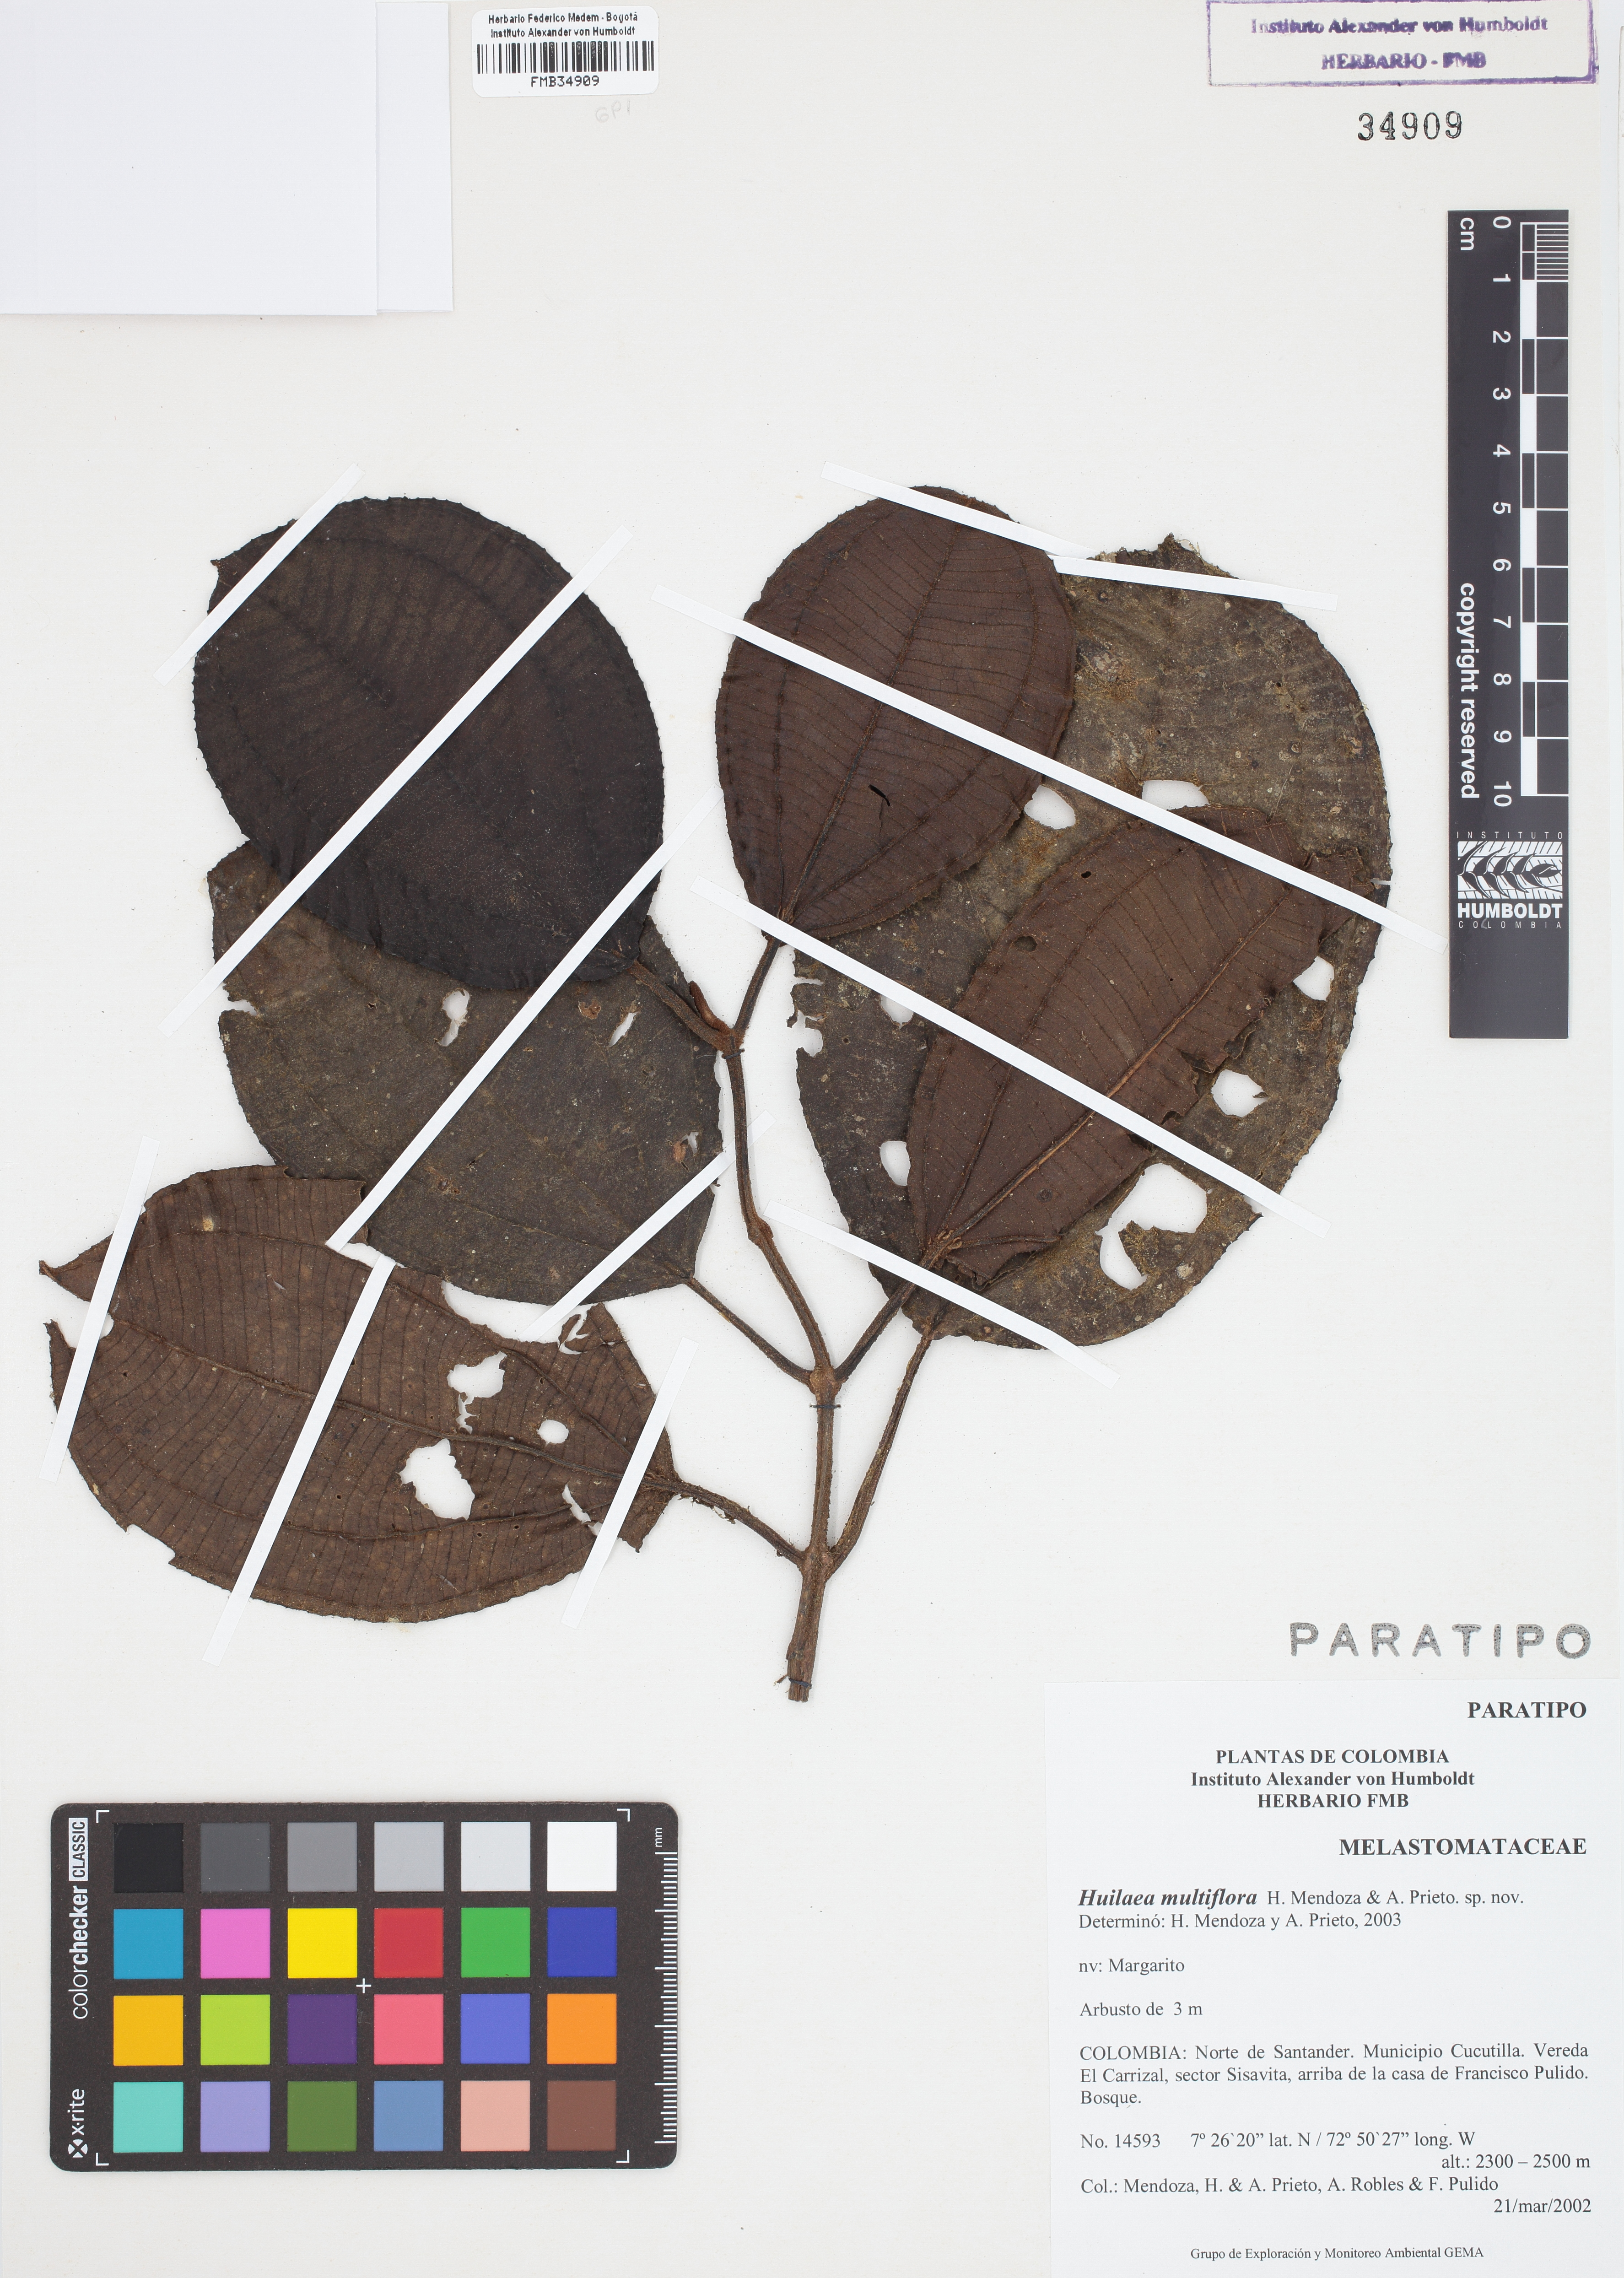 Paratipo de <em>Huilaea multiflora</em>, FMB-34909, Fotografía por Robles A.